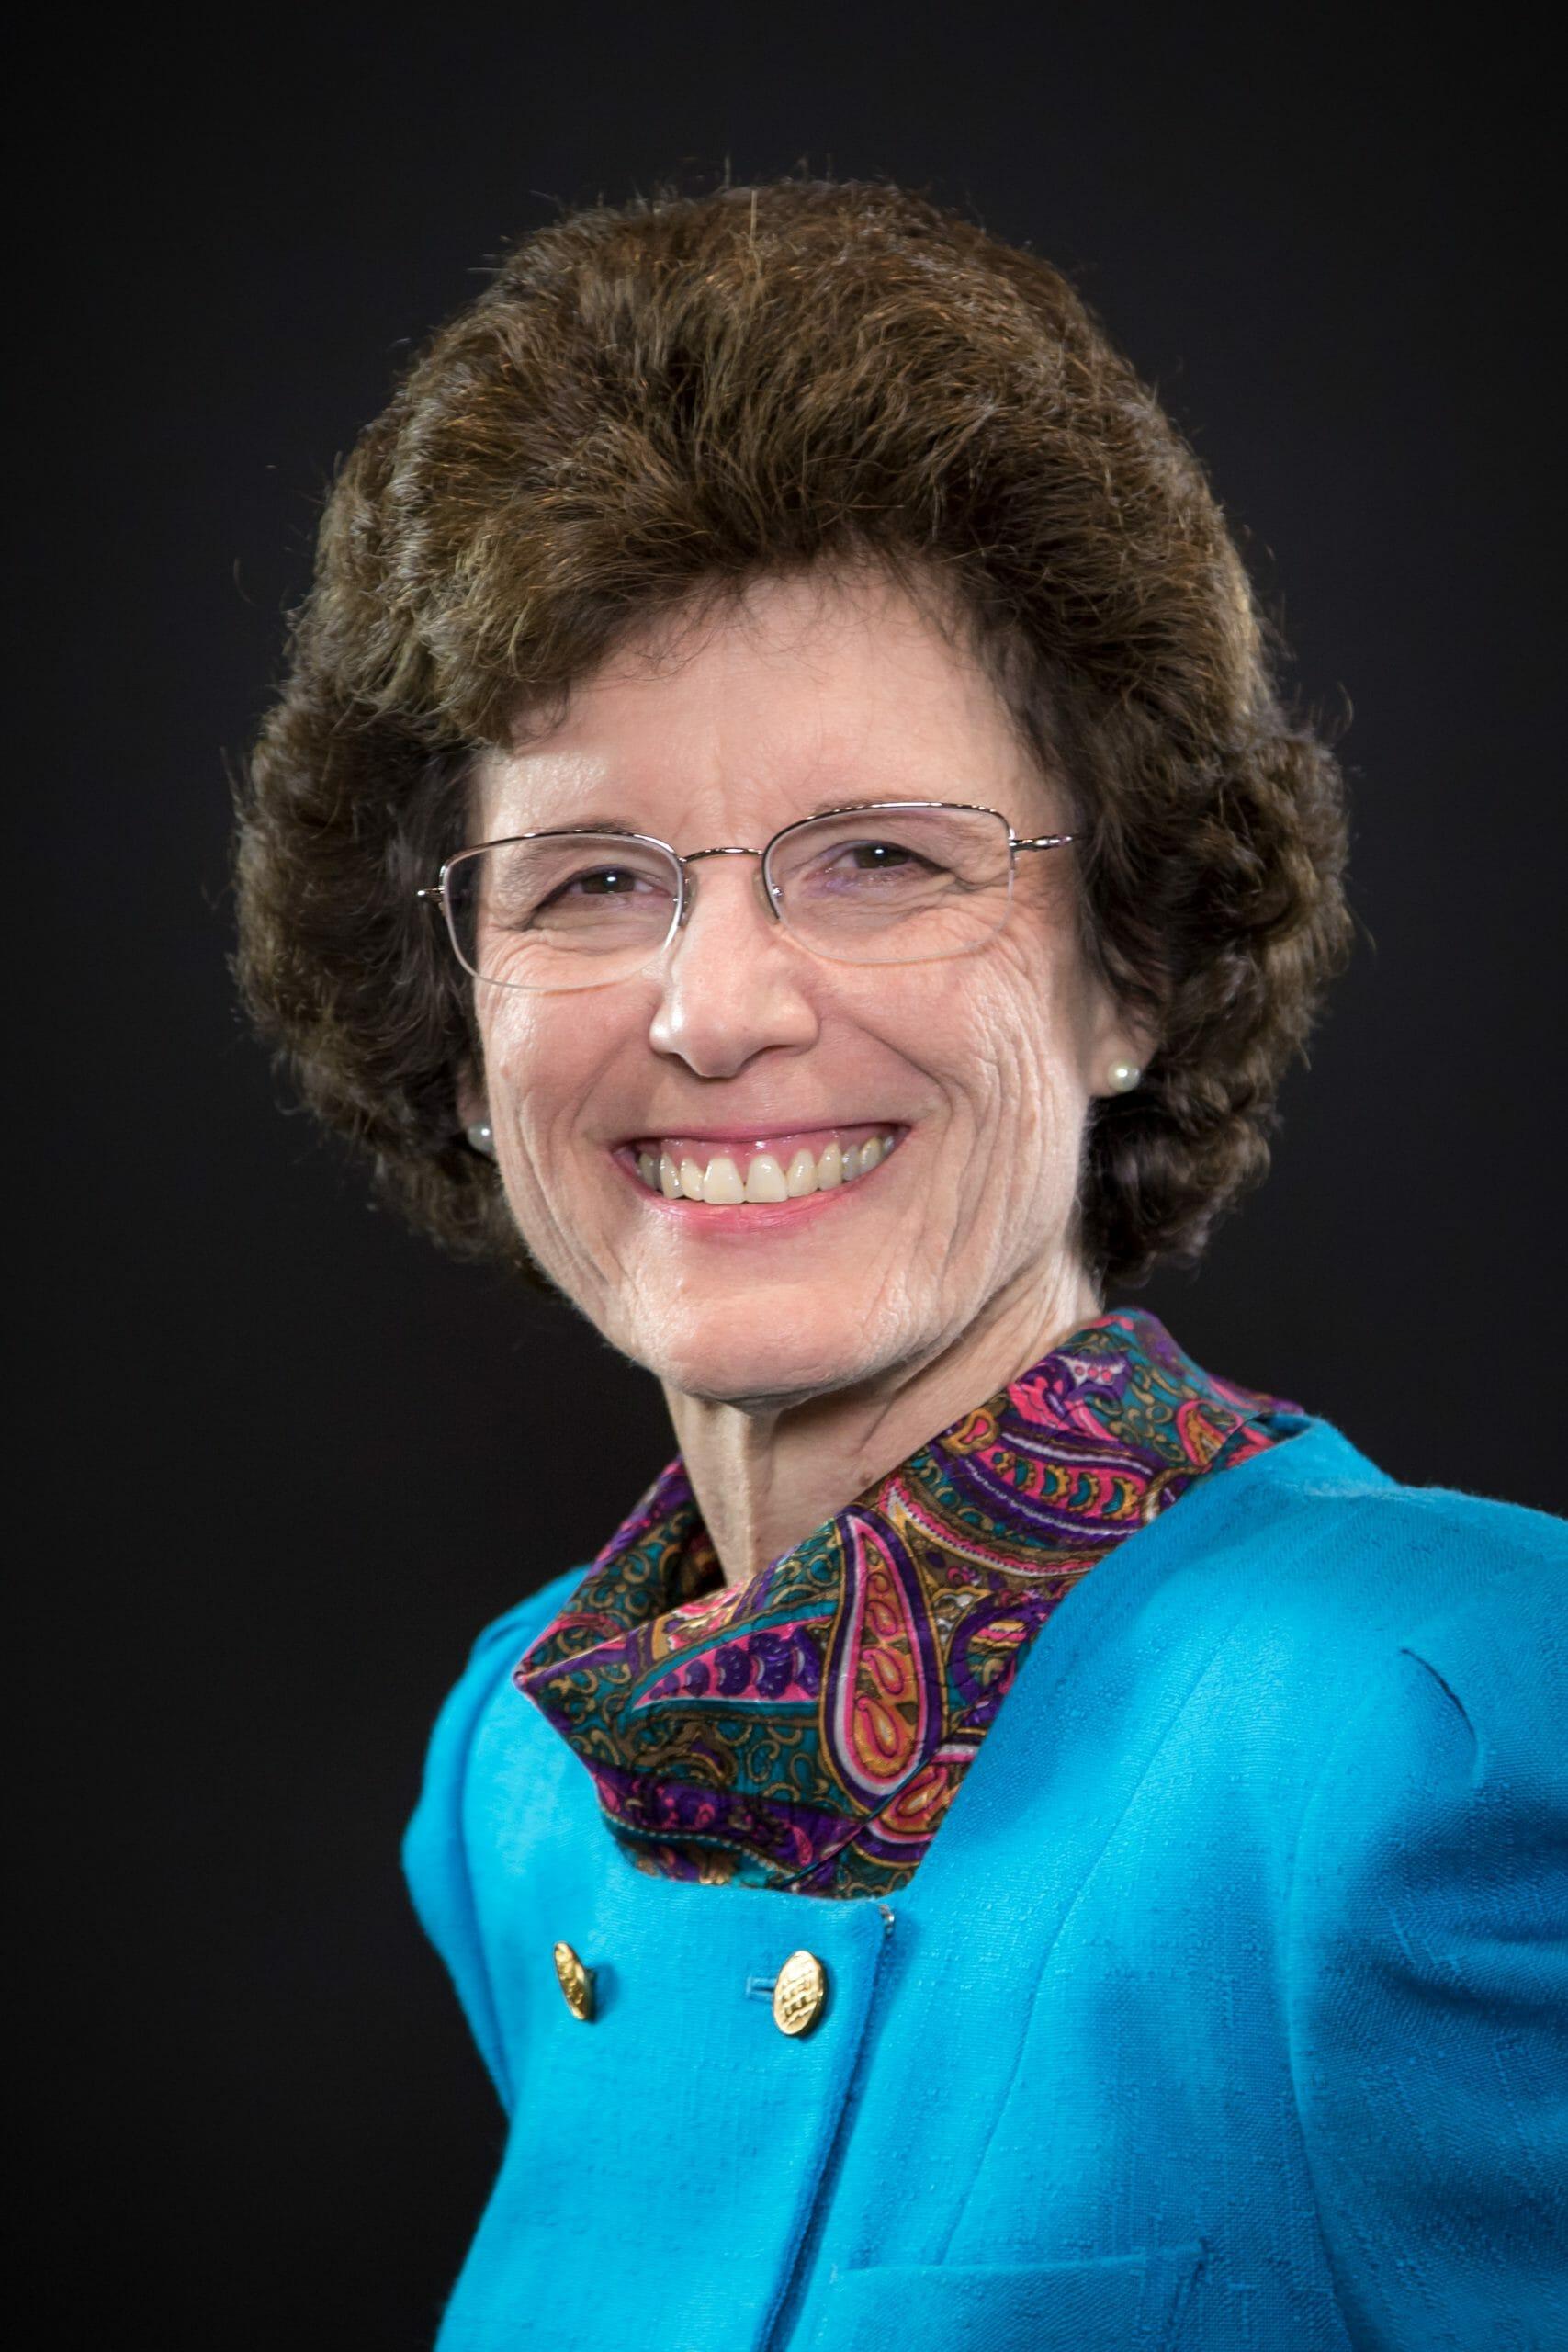 Photograph of Helaine Blum, President & CEO of Pathlight HOME